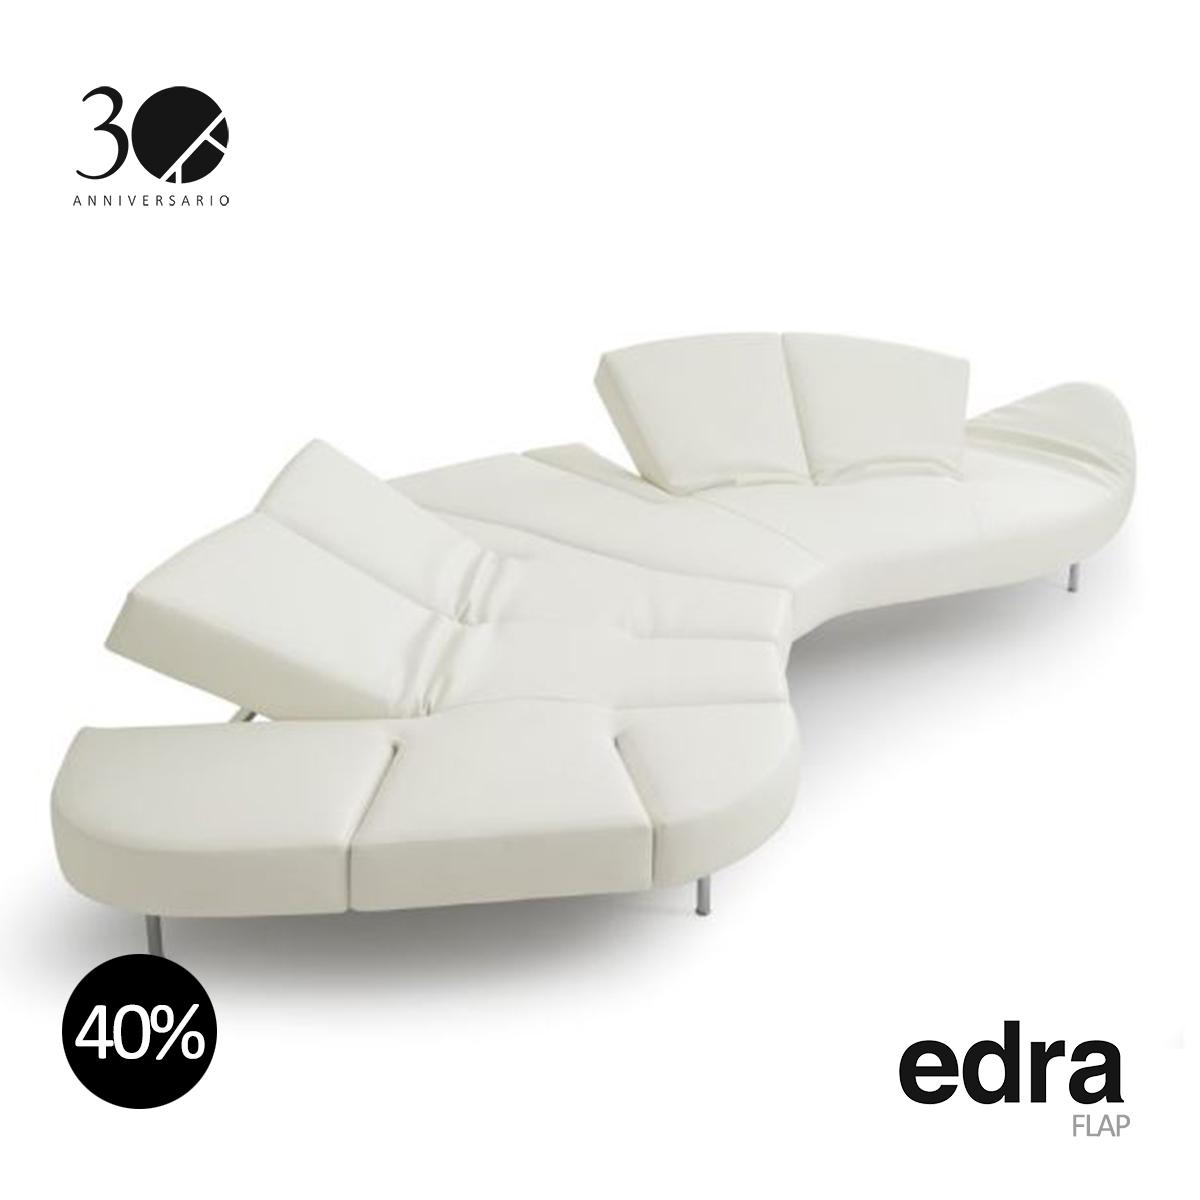 EDRA - FLAP